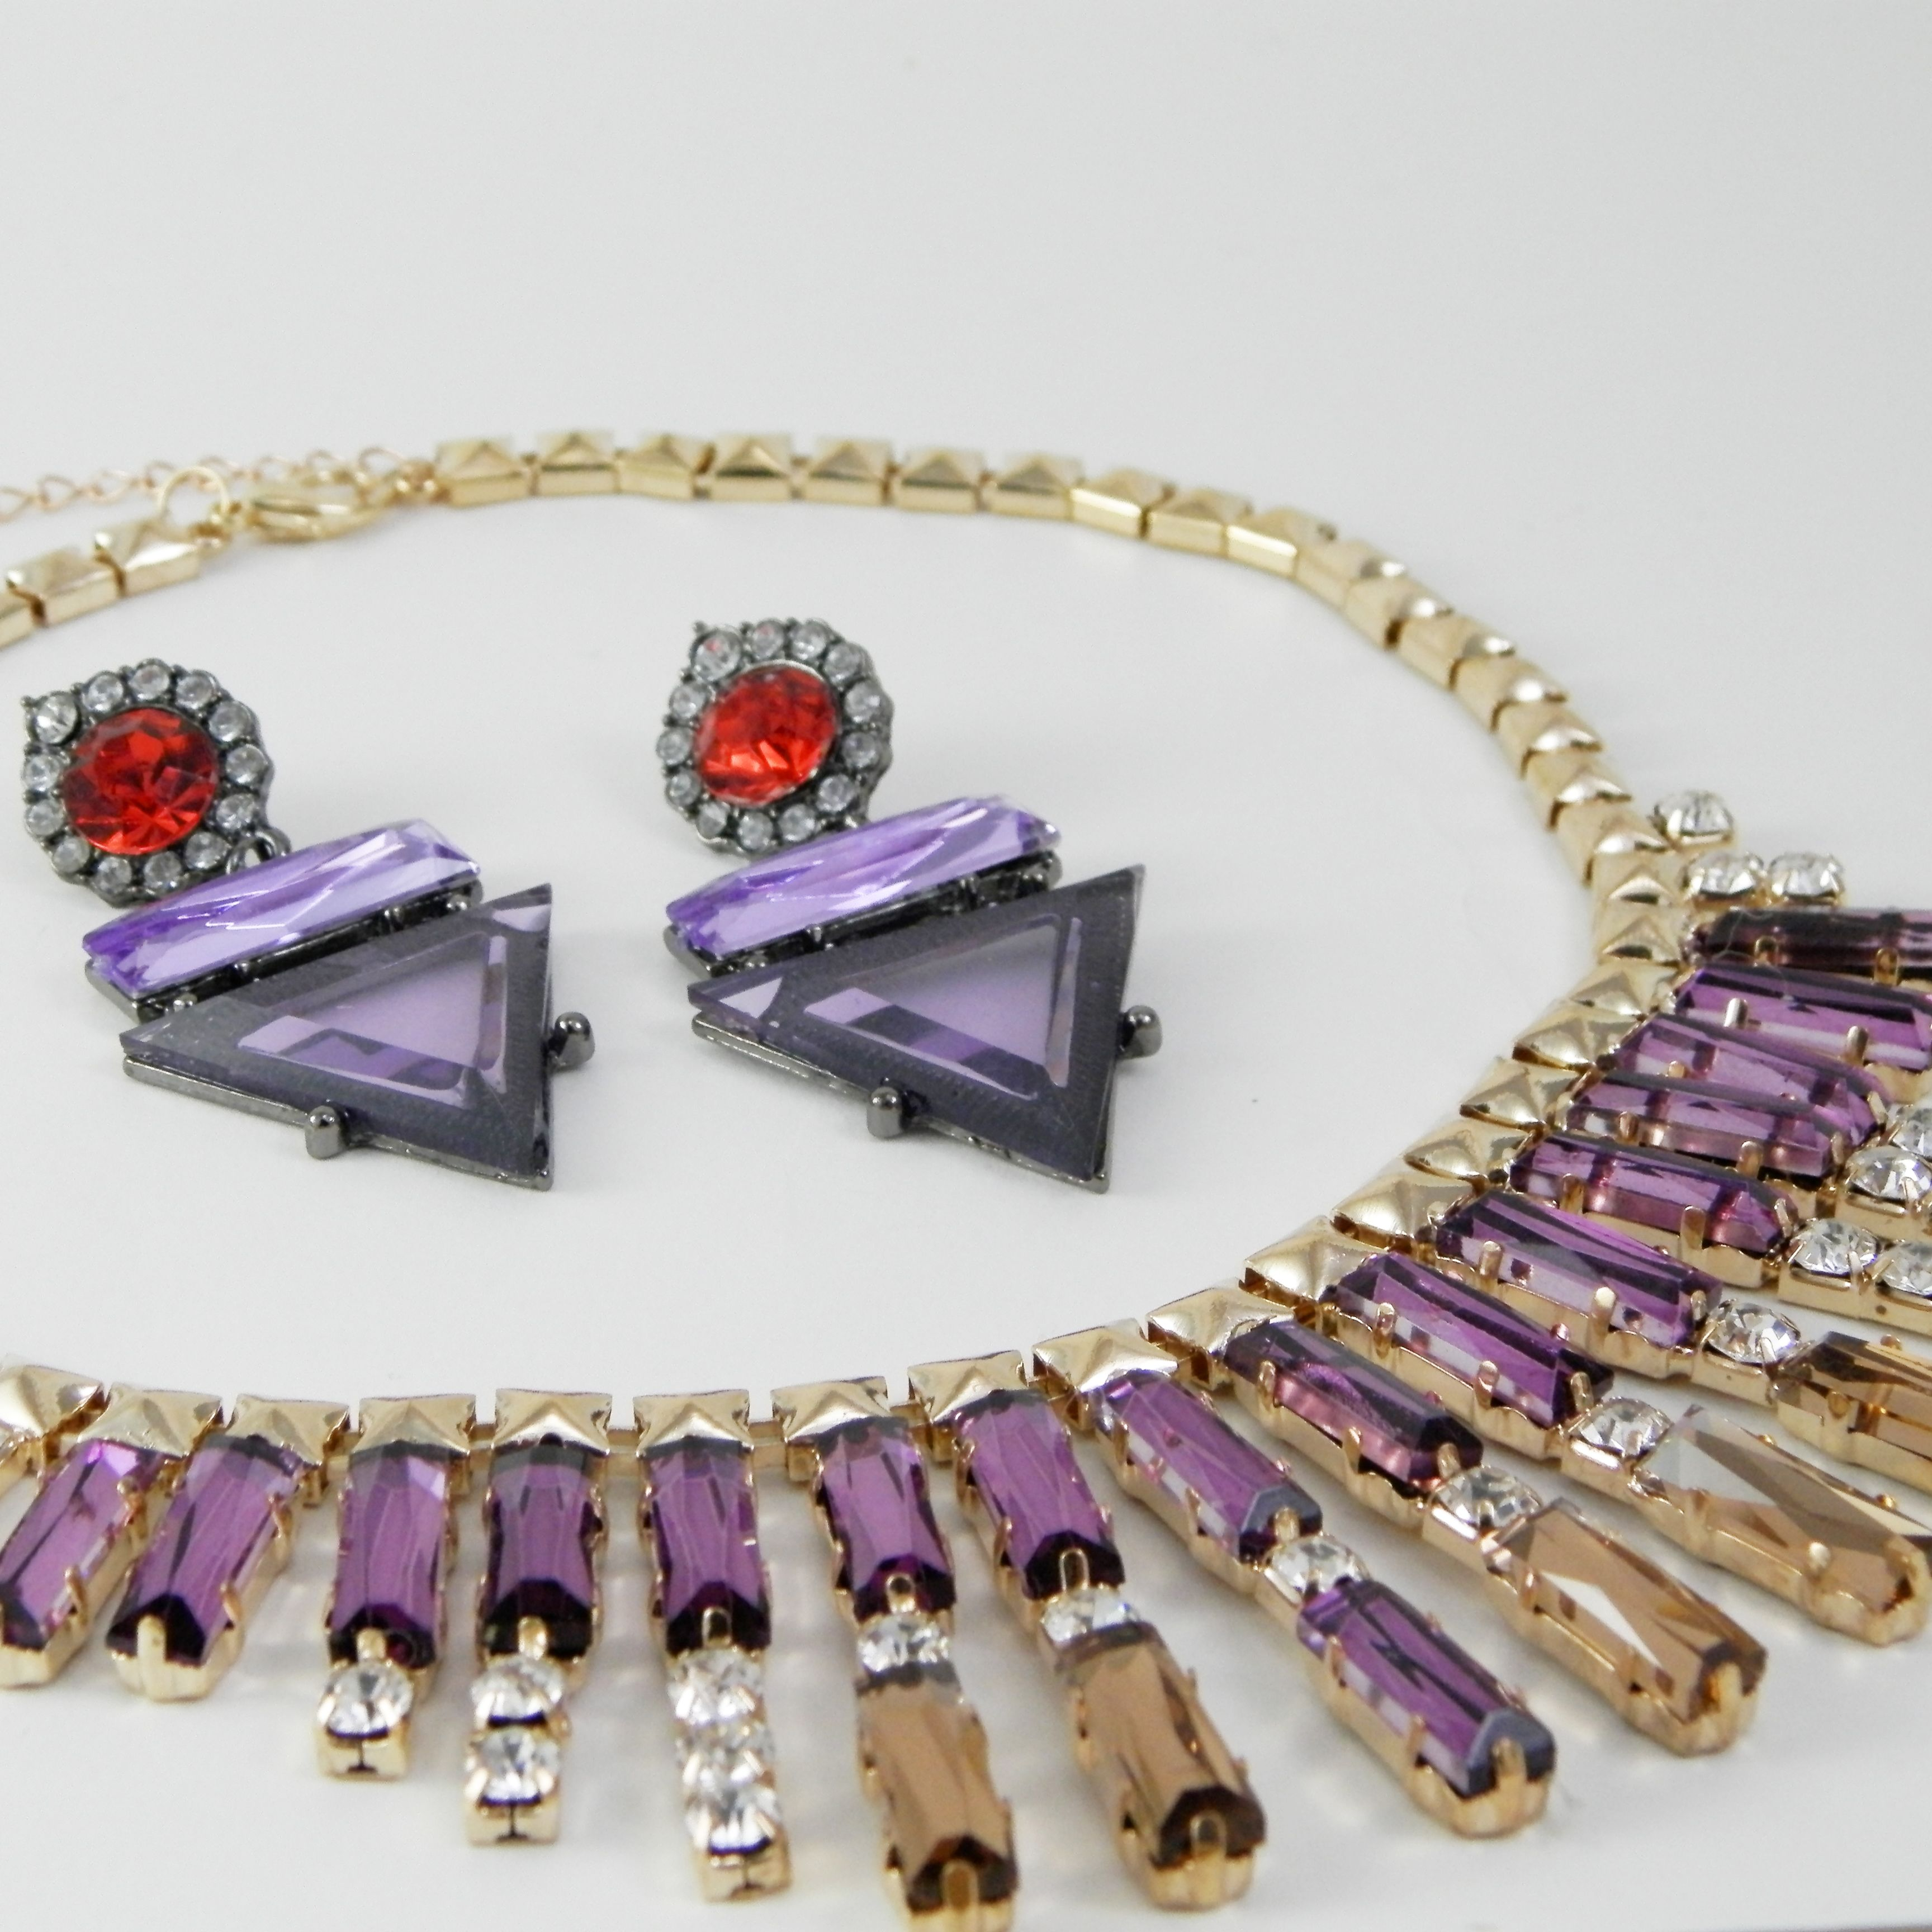 Dúo violeta  ww.missbrumma.com